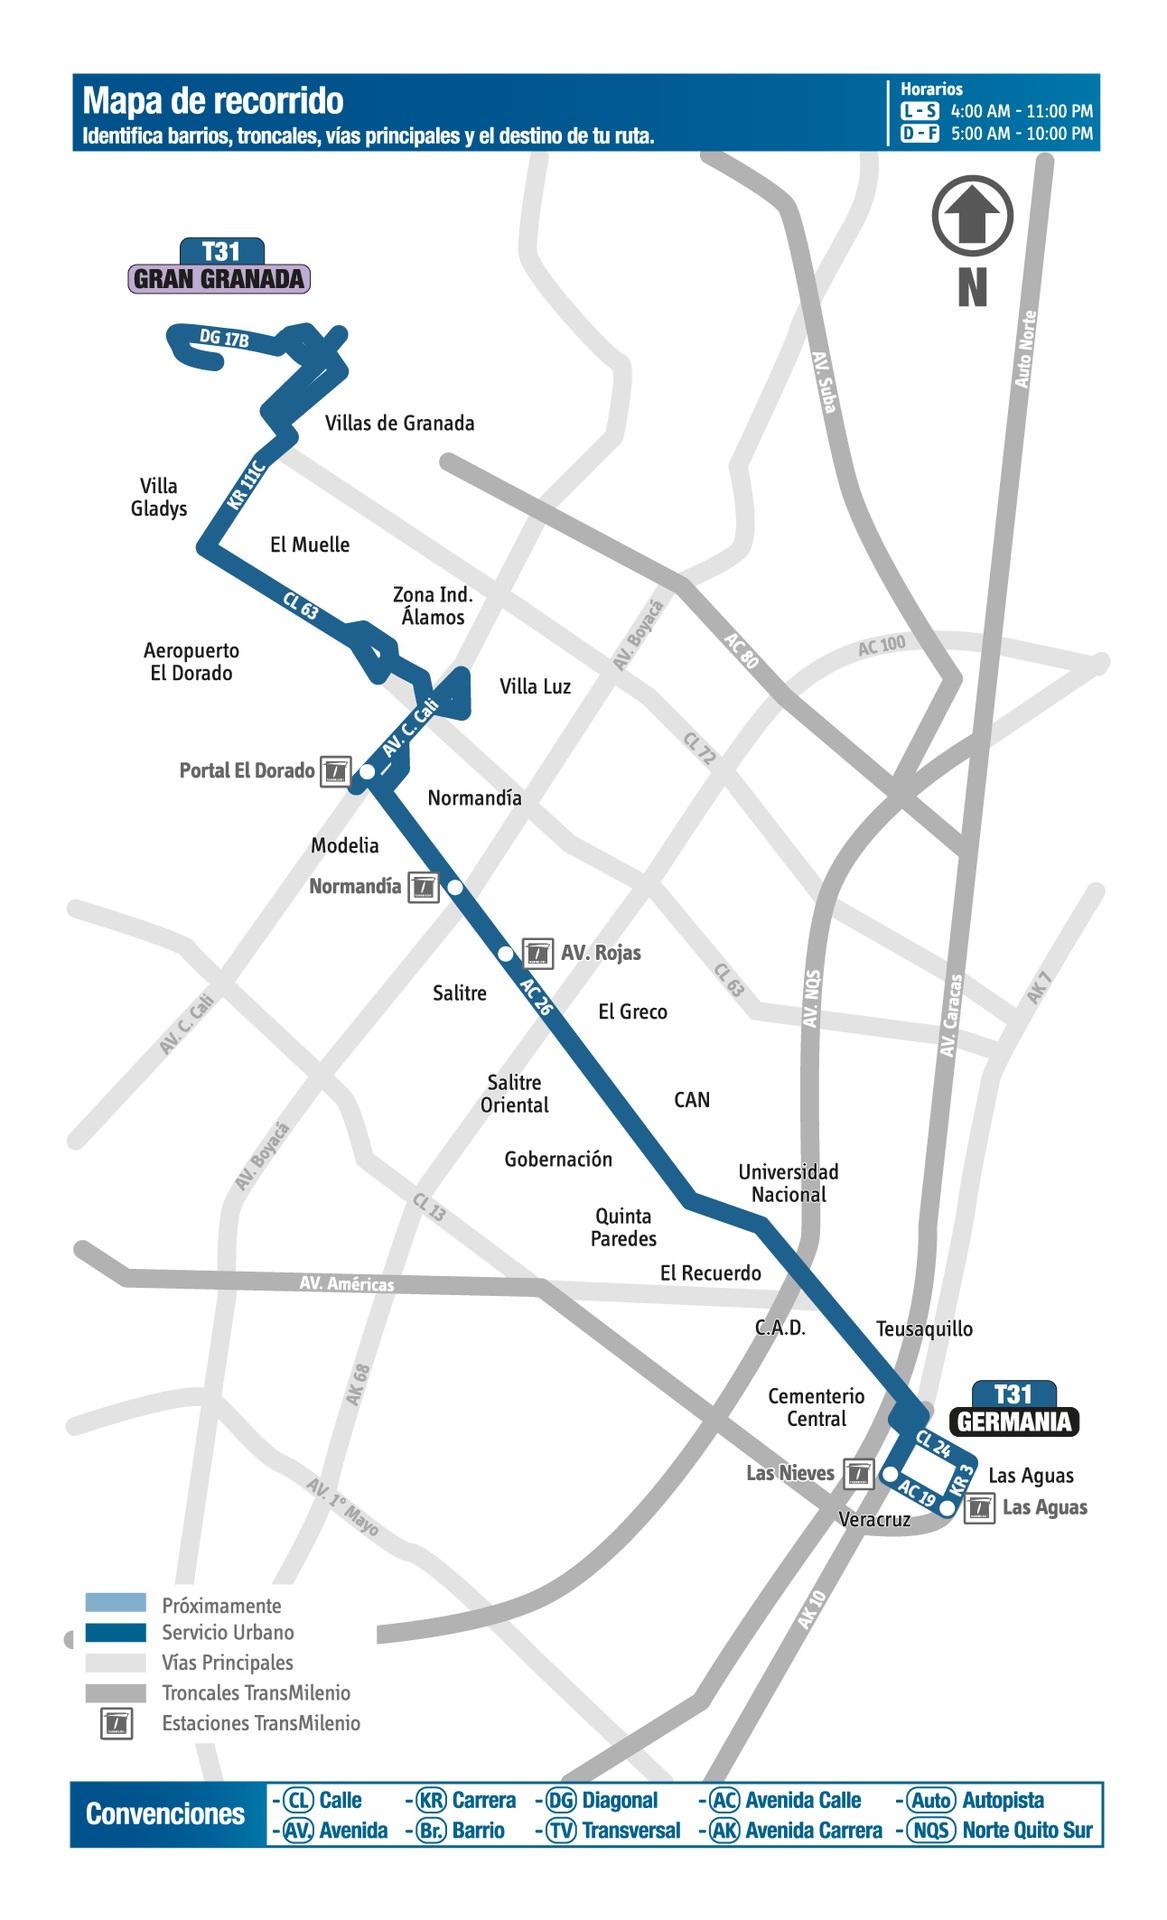 Ruta SITP: T31 - Gran Granada ↔ Germania [Urbana] 5